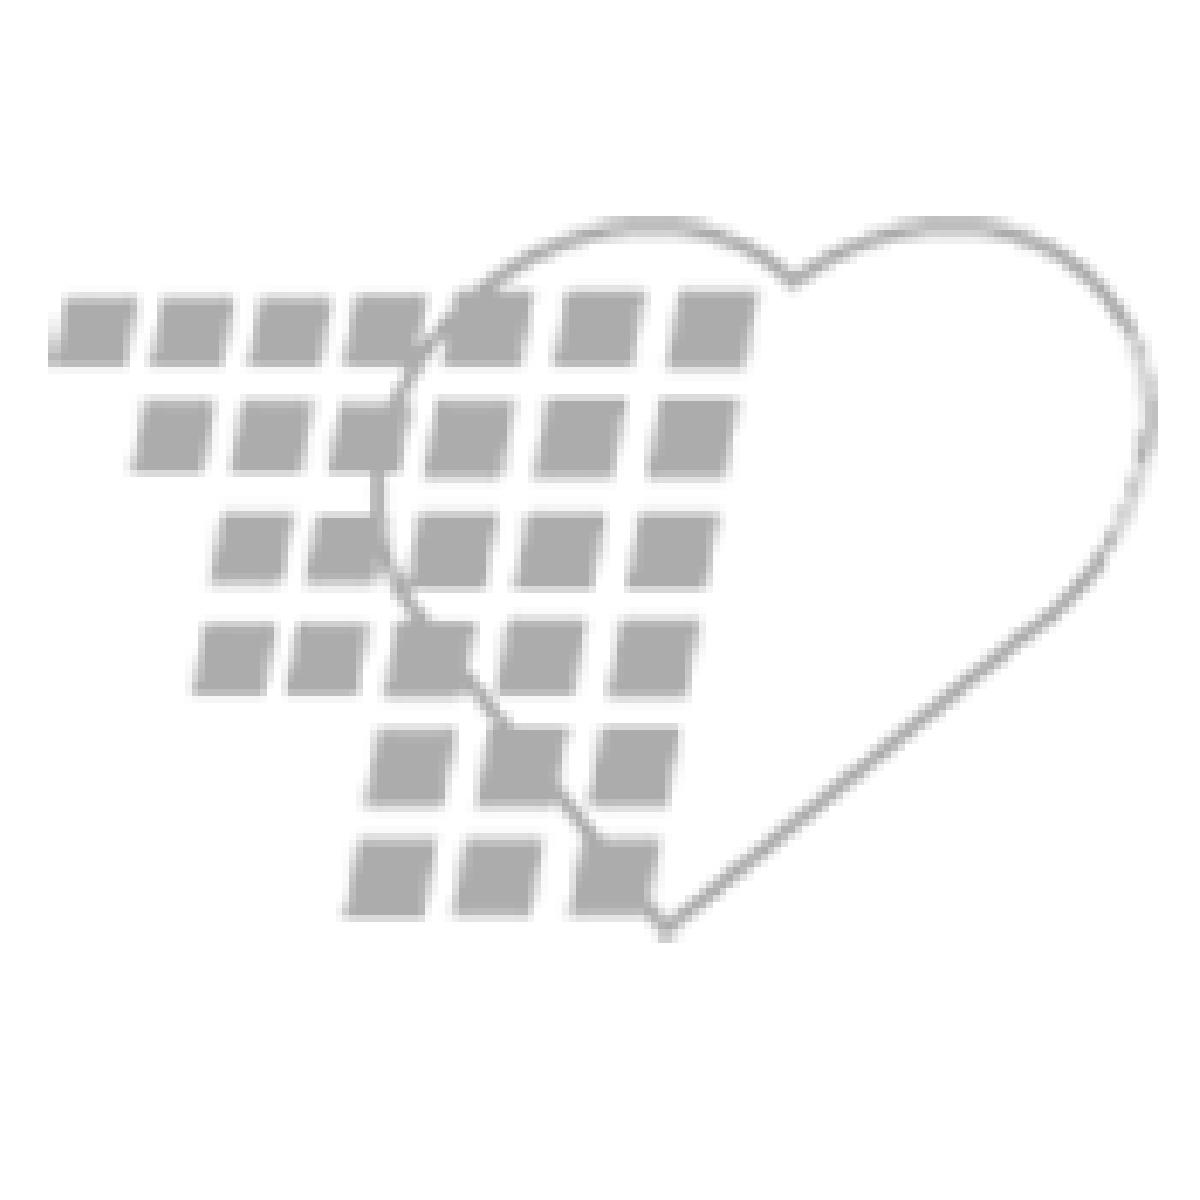 02-99-0051 - Prestan Replacement Pads